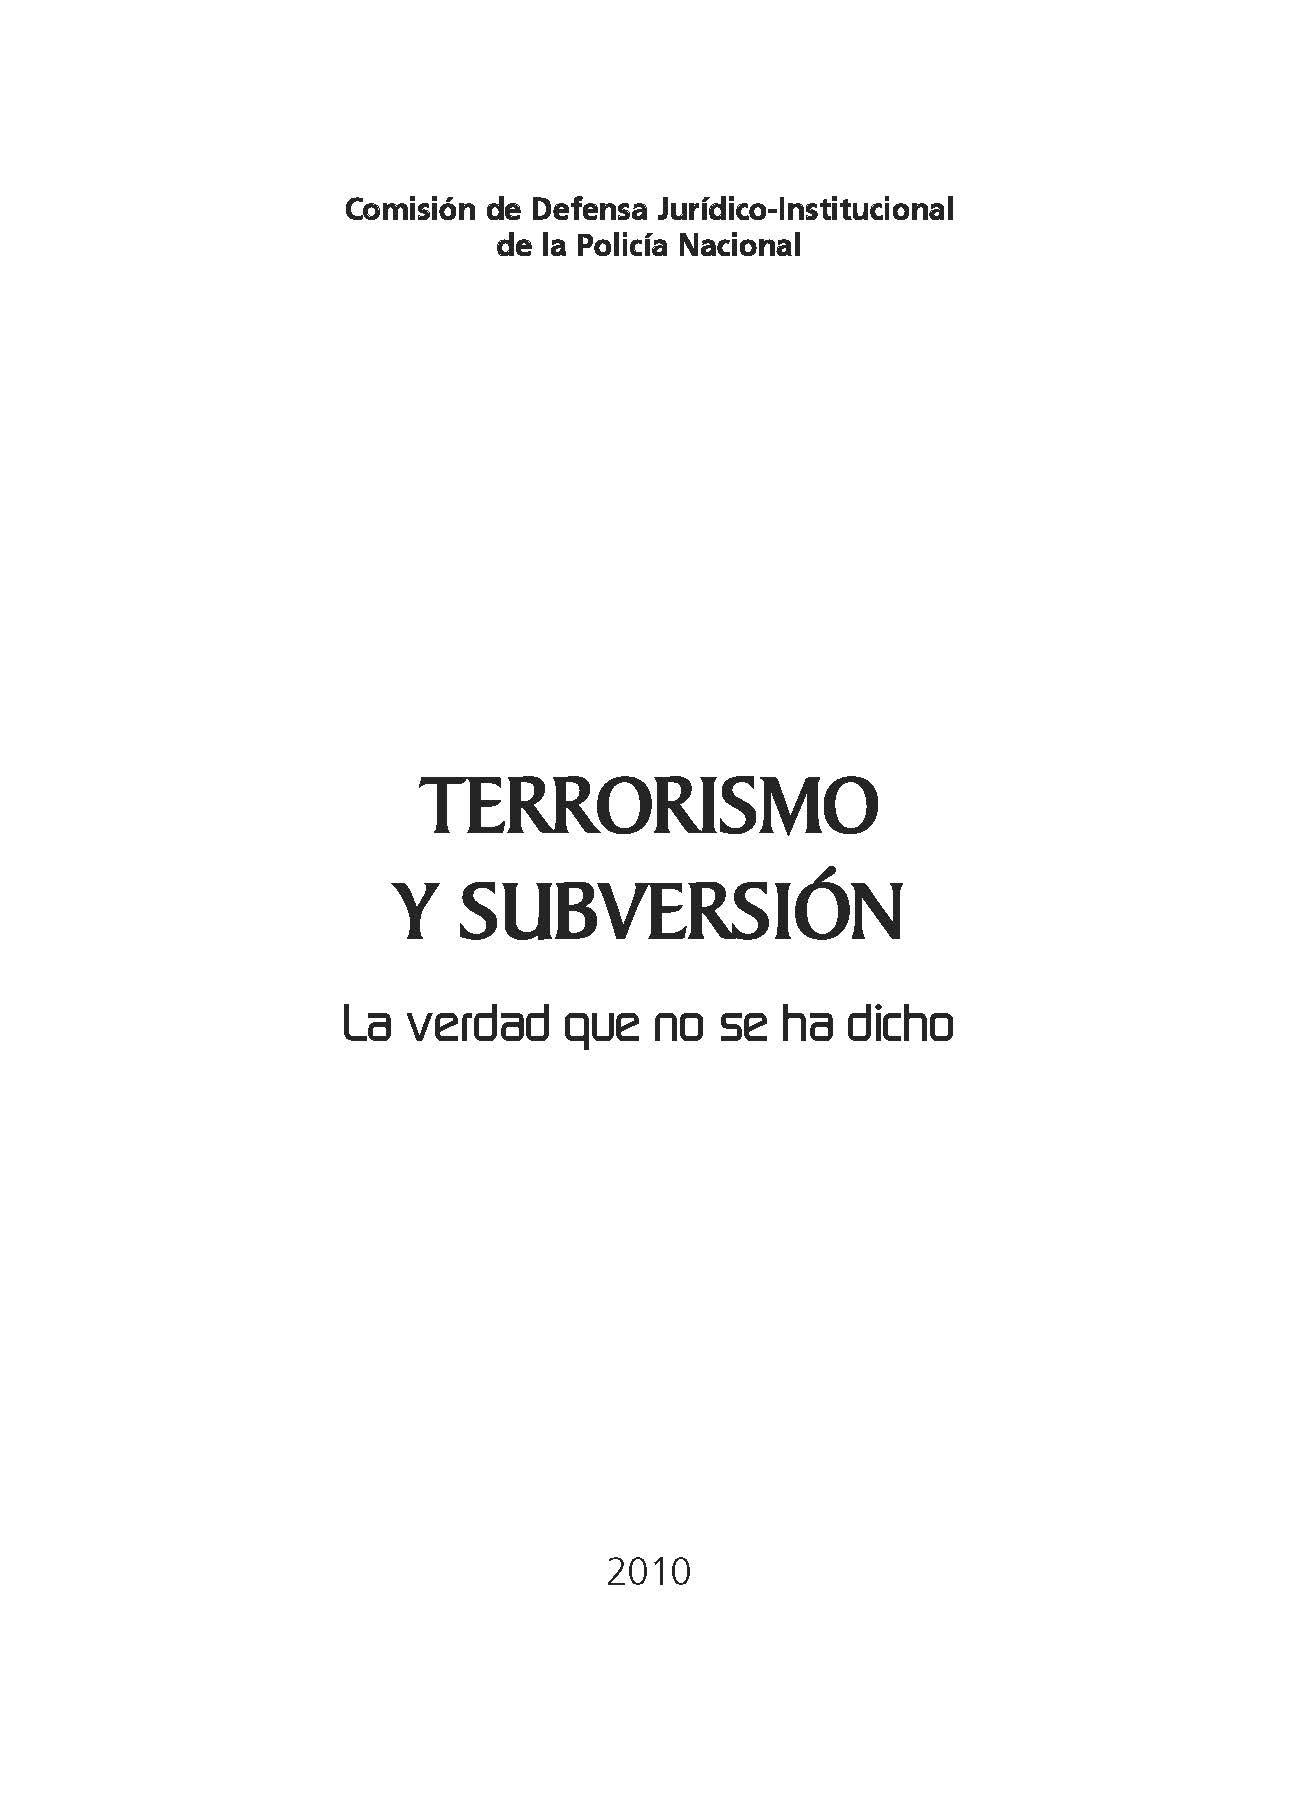 TERRORISMOYSUBVERSIONfotos2_Page_1